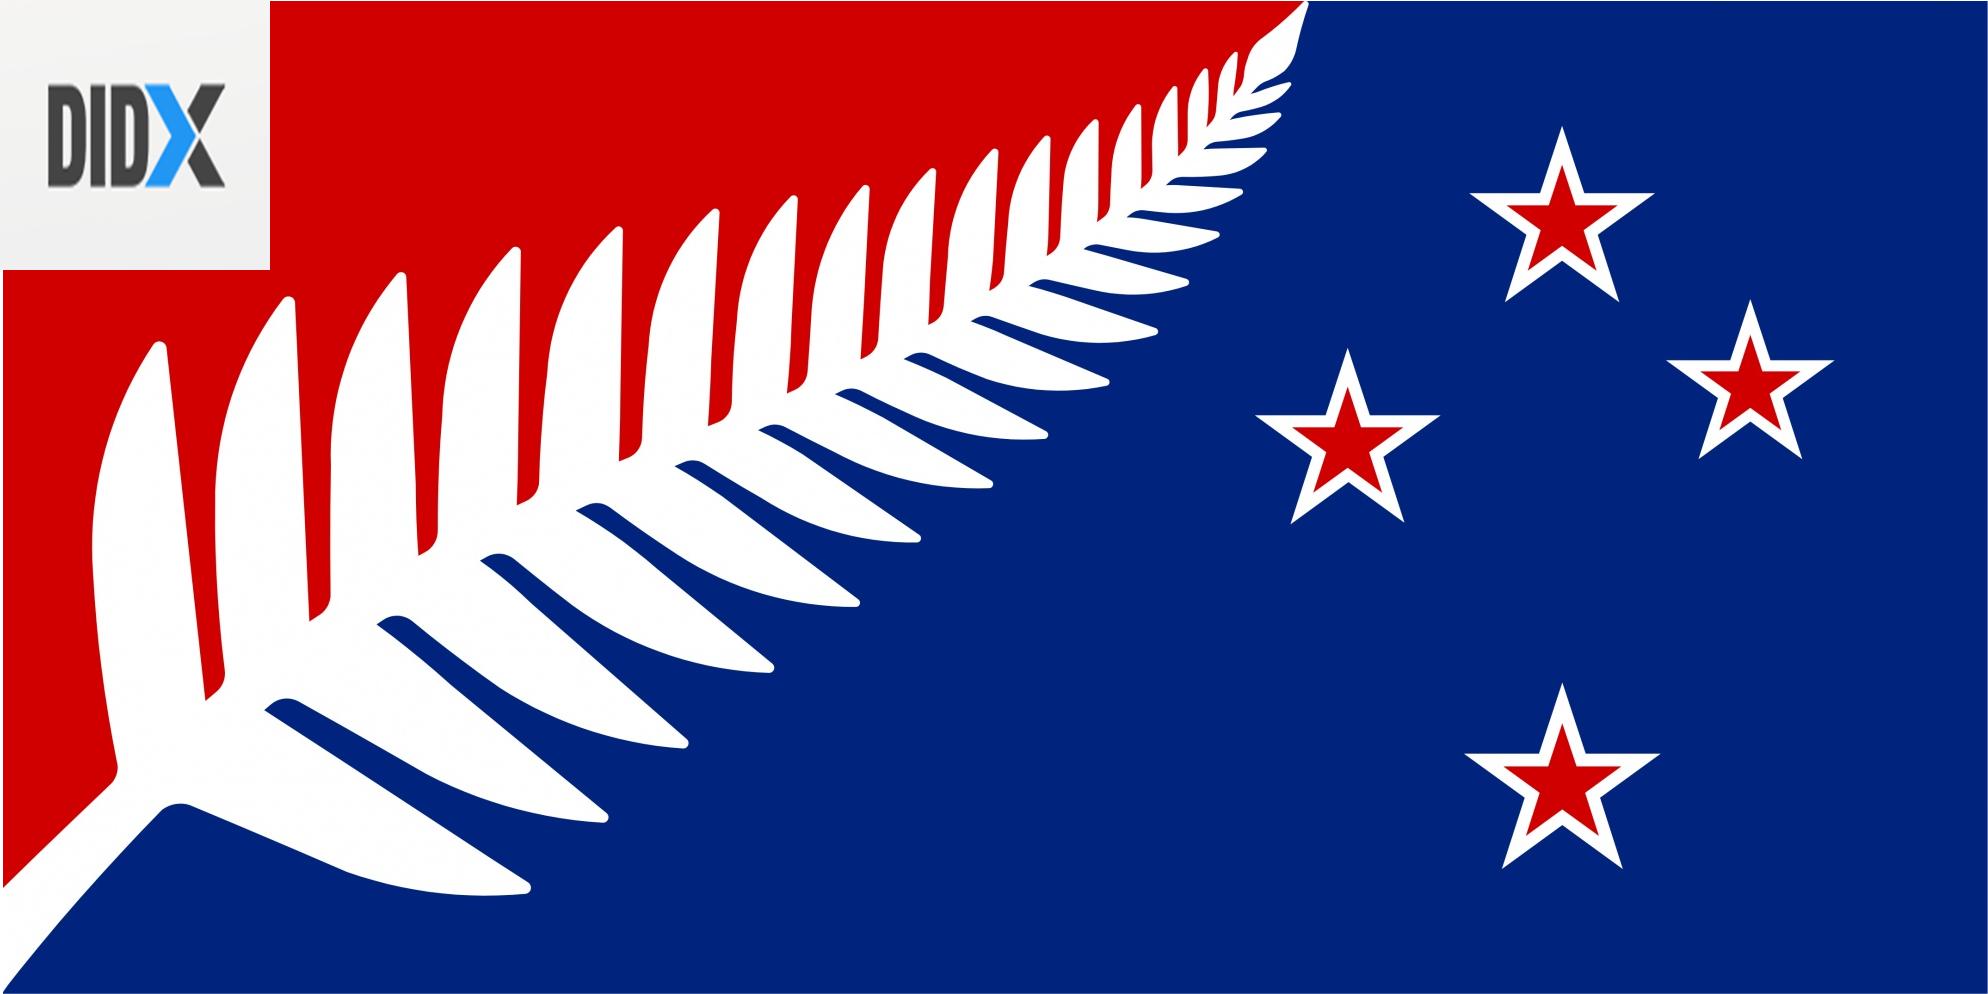 imagehub peru flag hd free download image repository